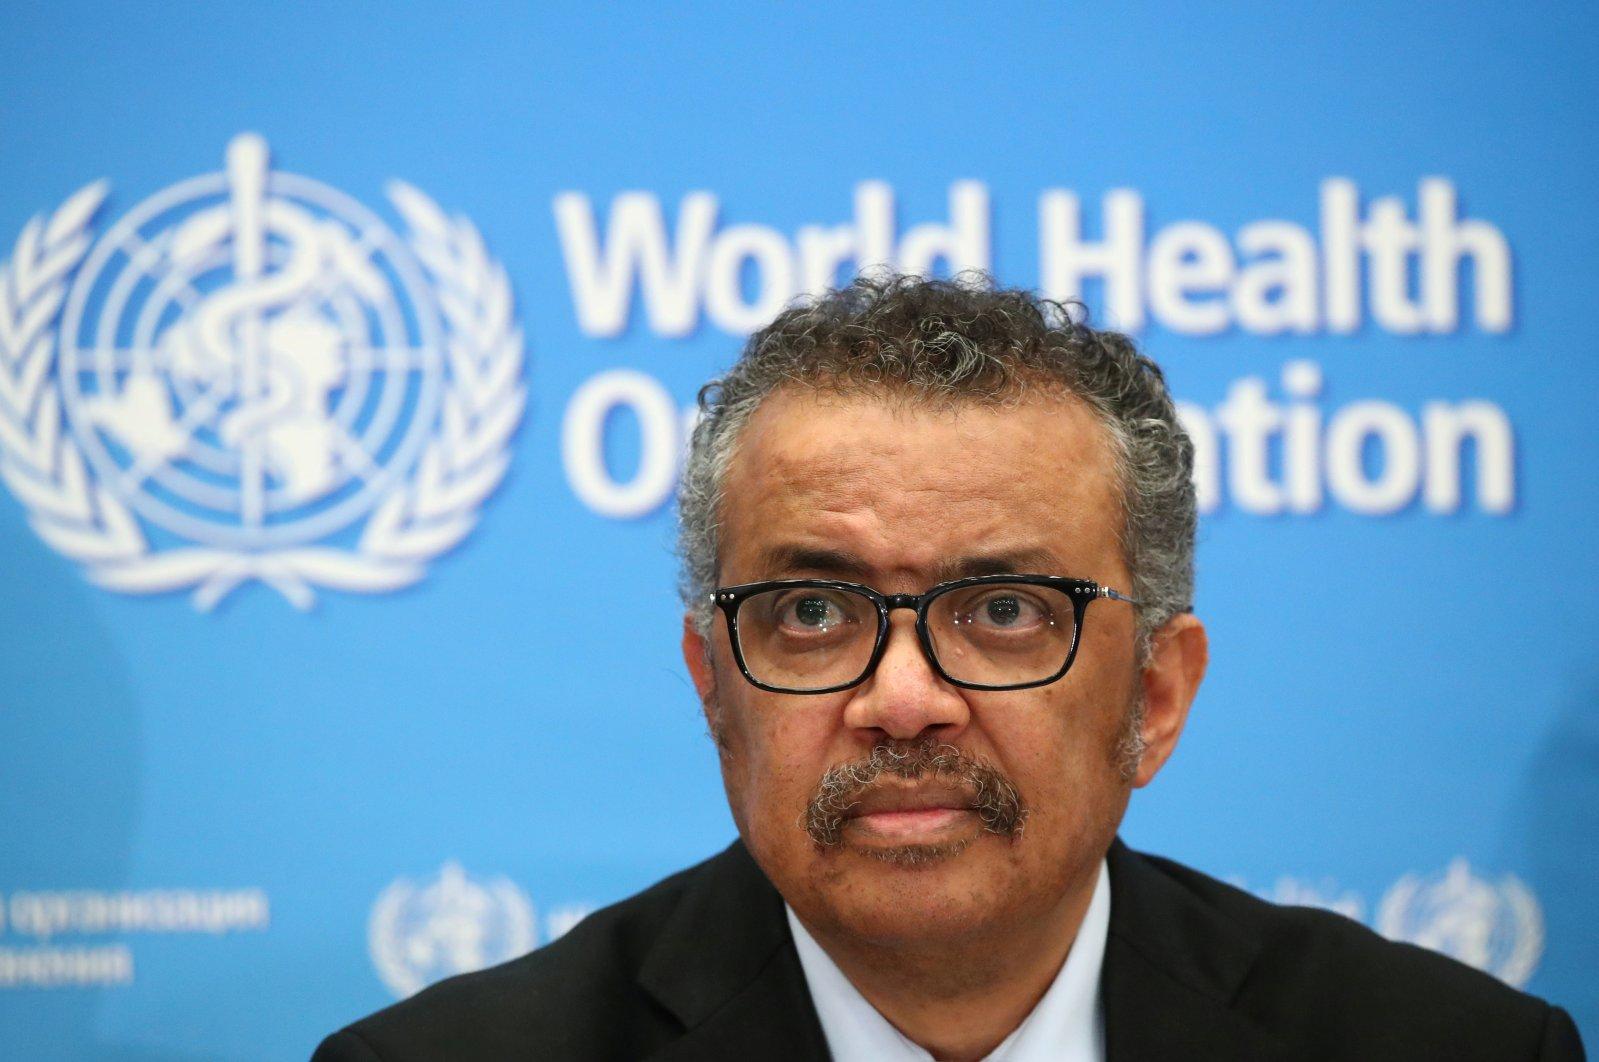 Director-General of the WHO Tedros Adhanom Ghebreyesus. (REUTERS PHOTO)